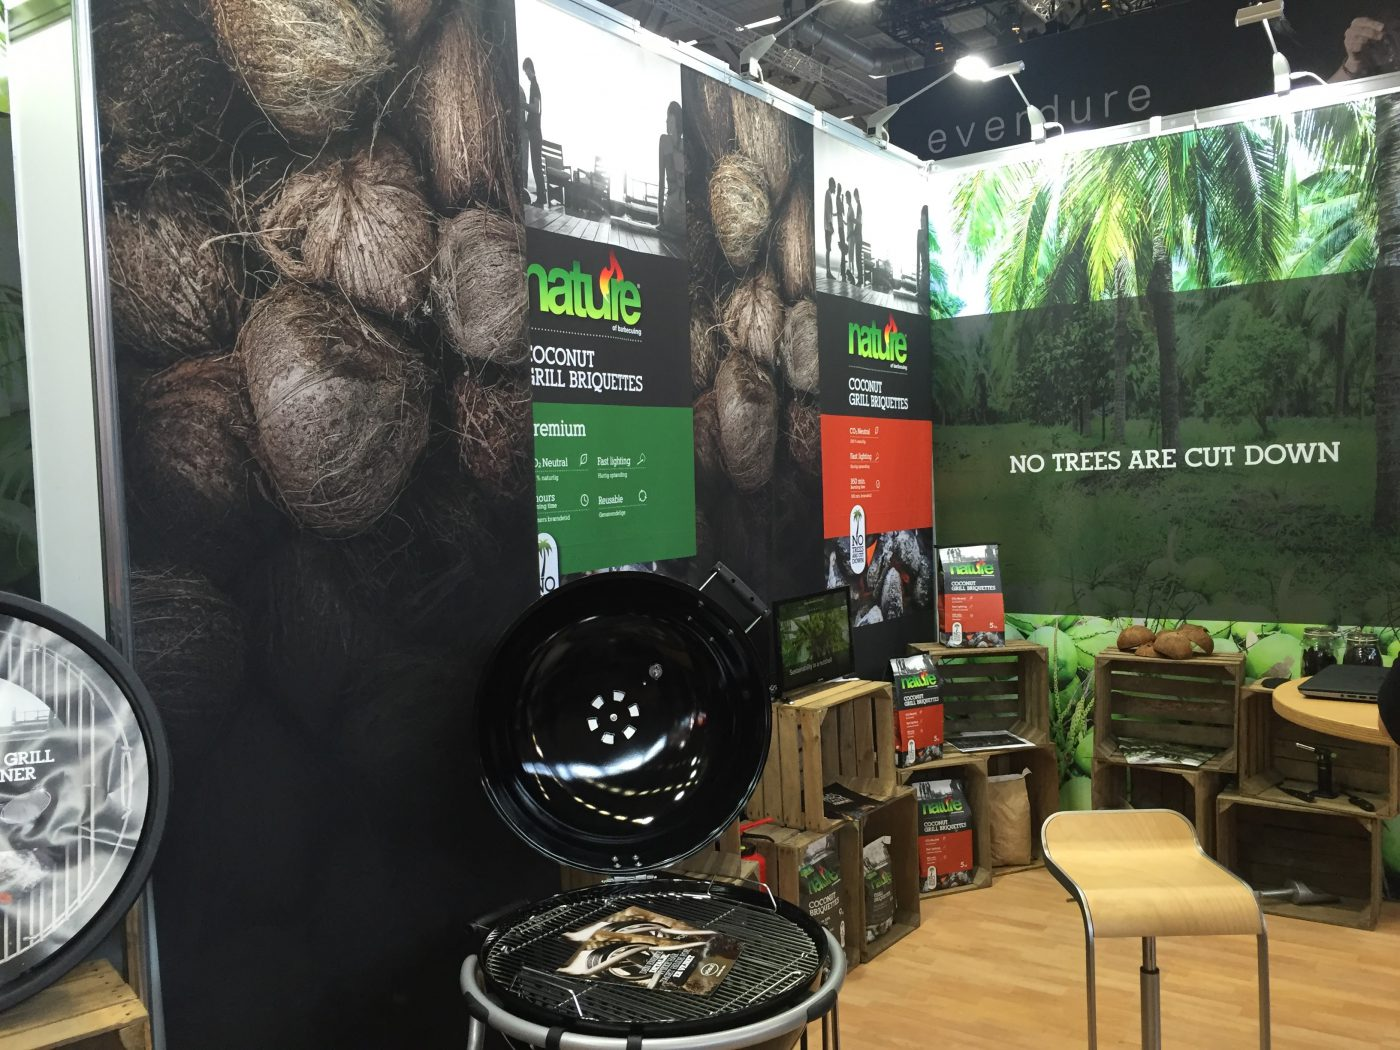 nature – coconut grill briquettes